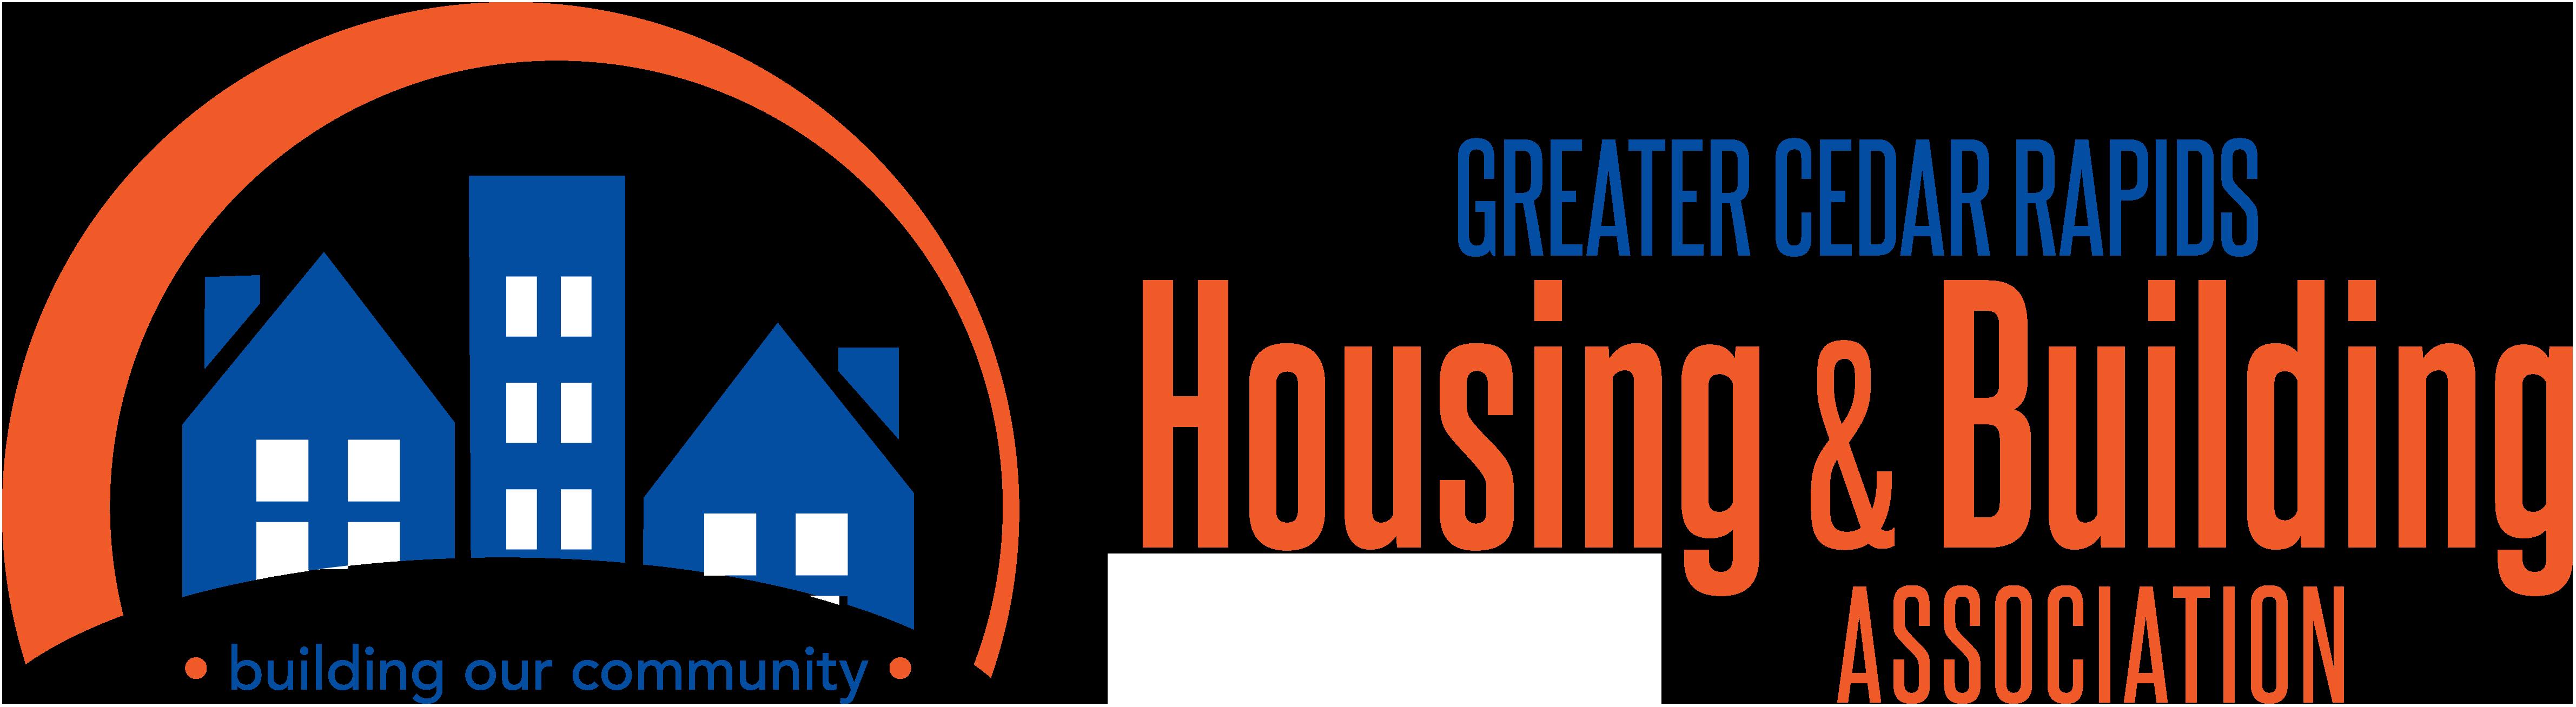 Directory Greater Cedar Rapids Housing Building Association